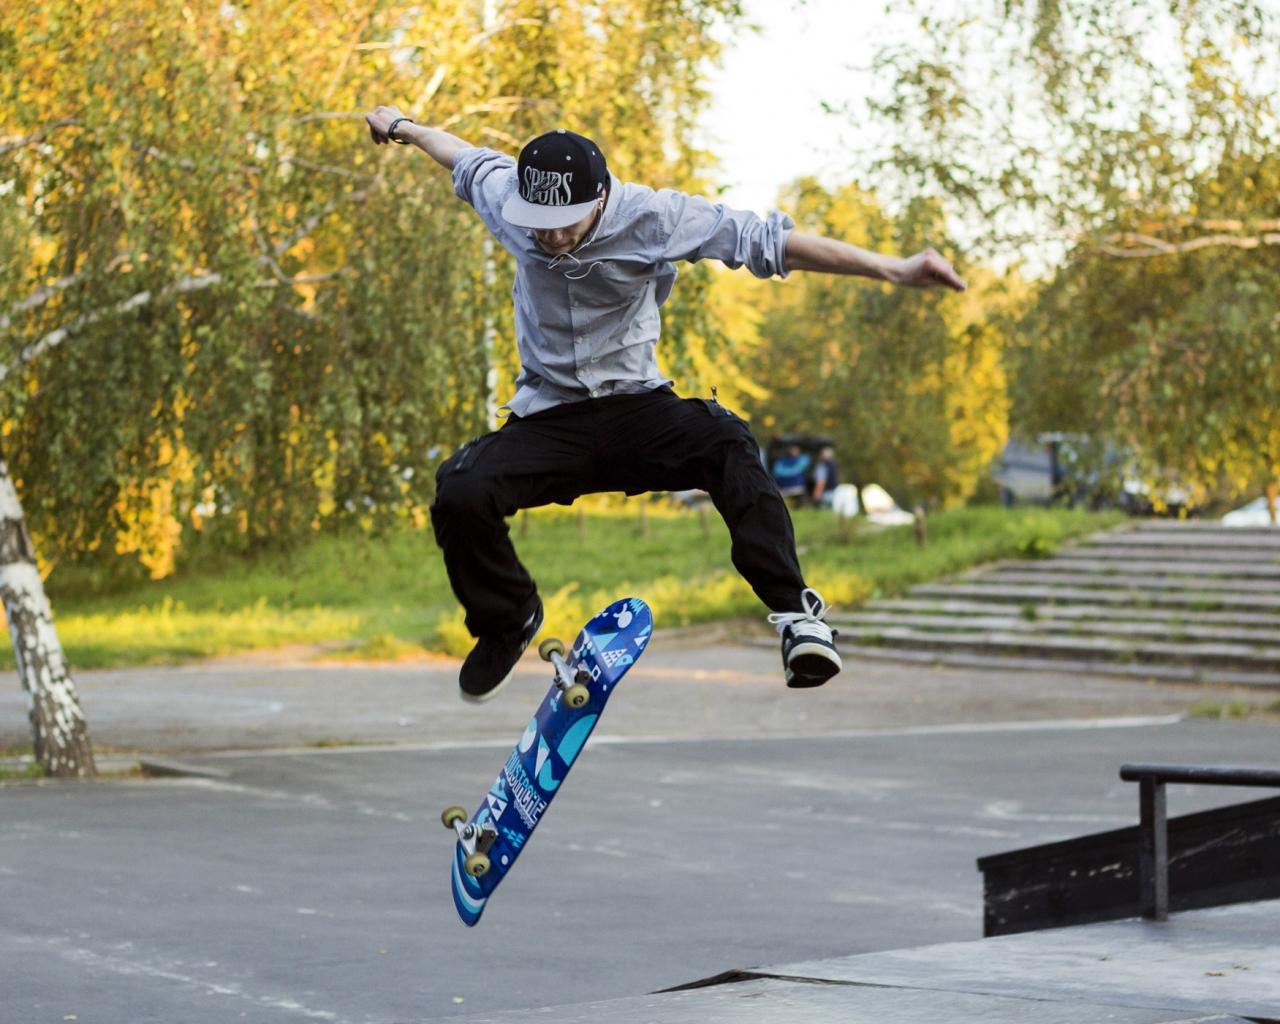 Trucos con skate - 1280x1024